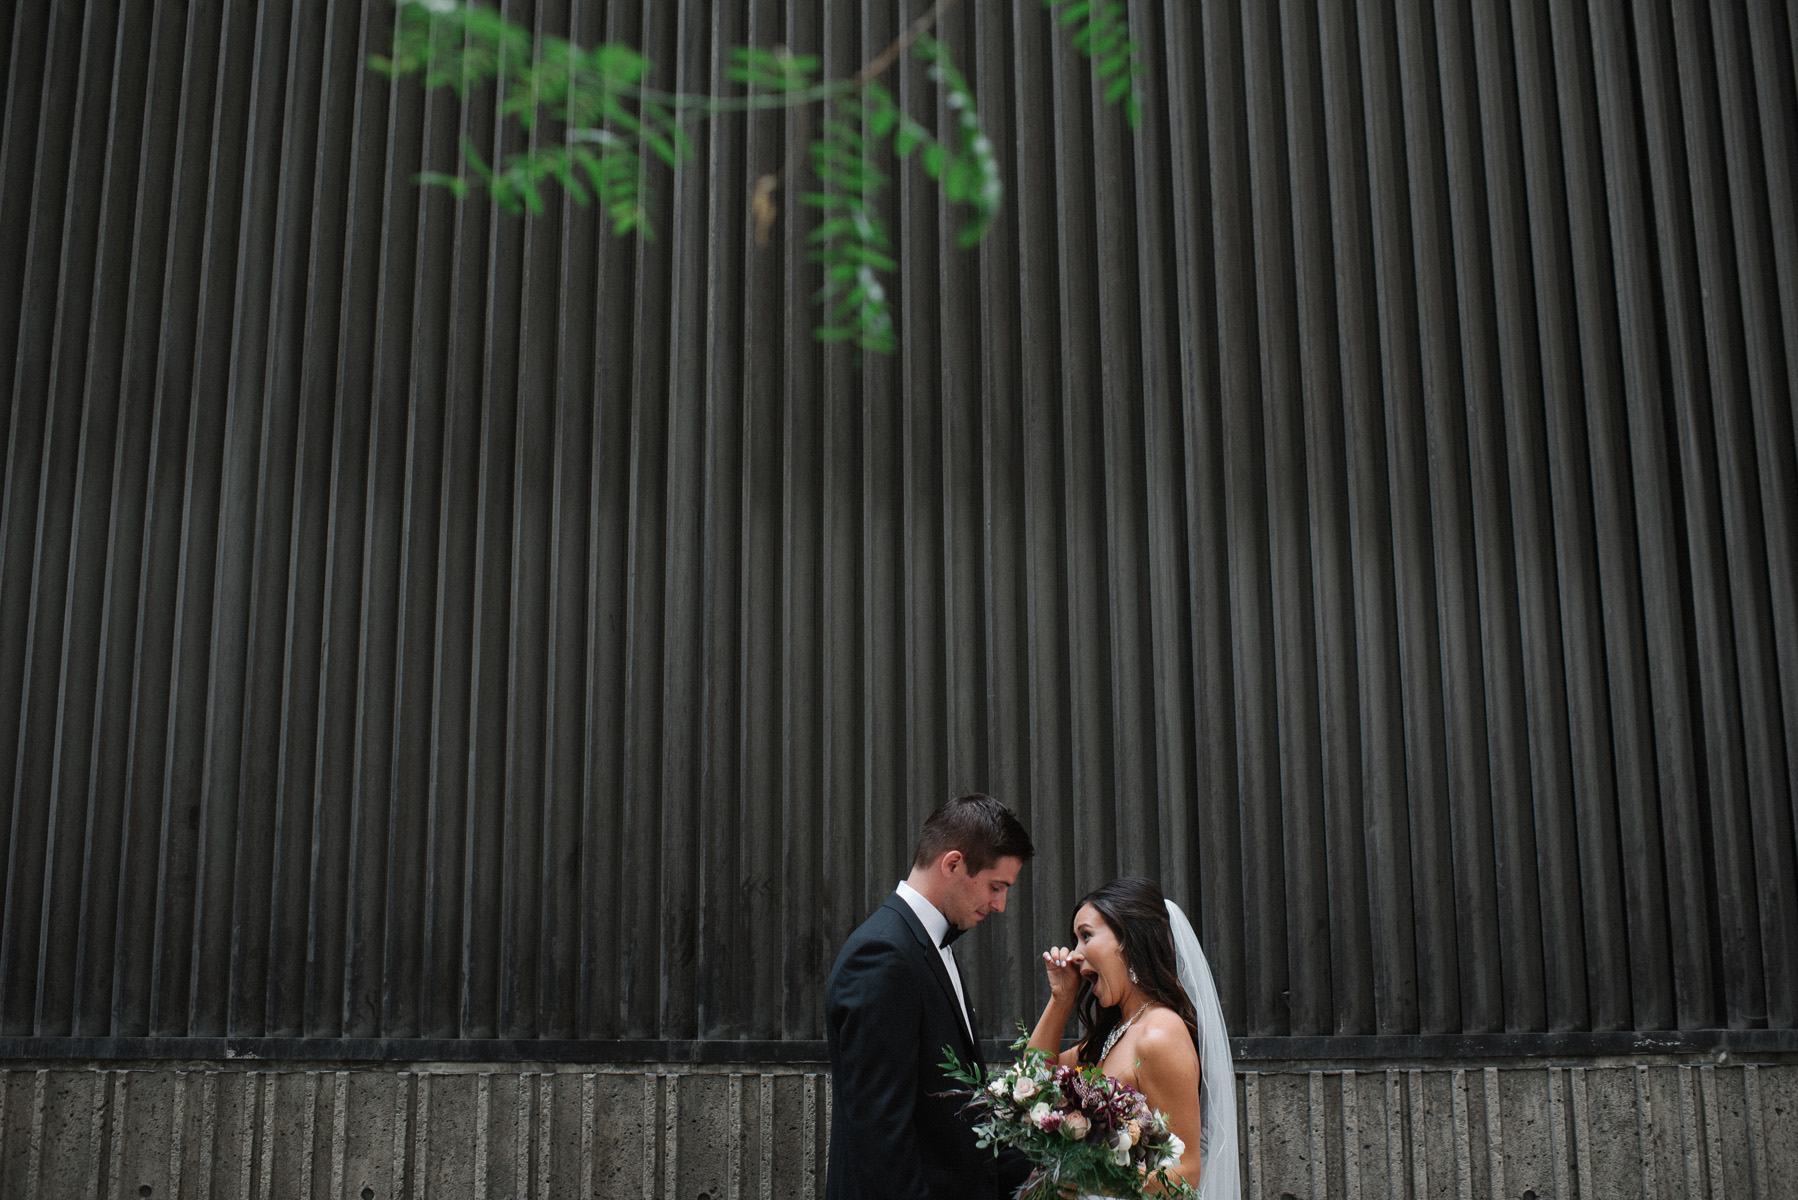 The Wedding Co.   Sarah and JP